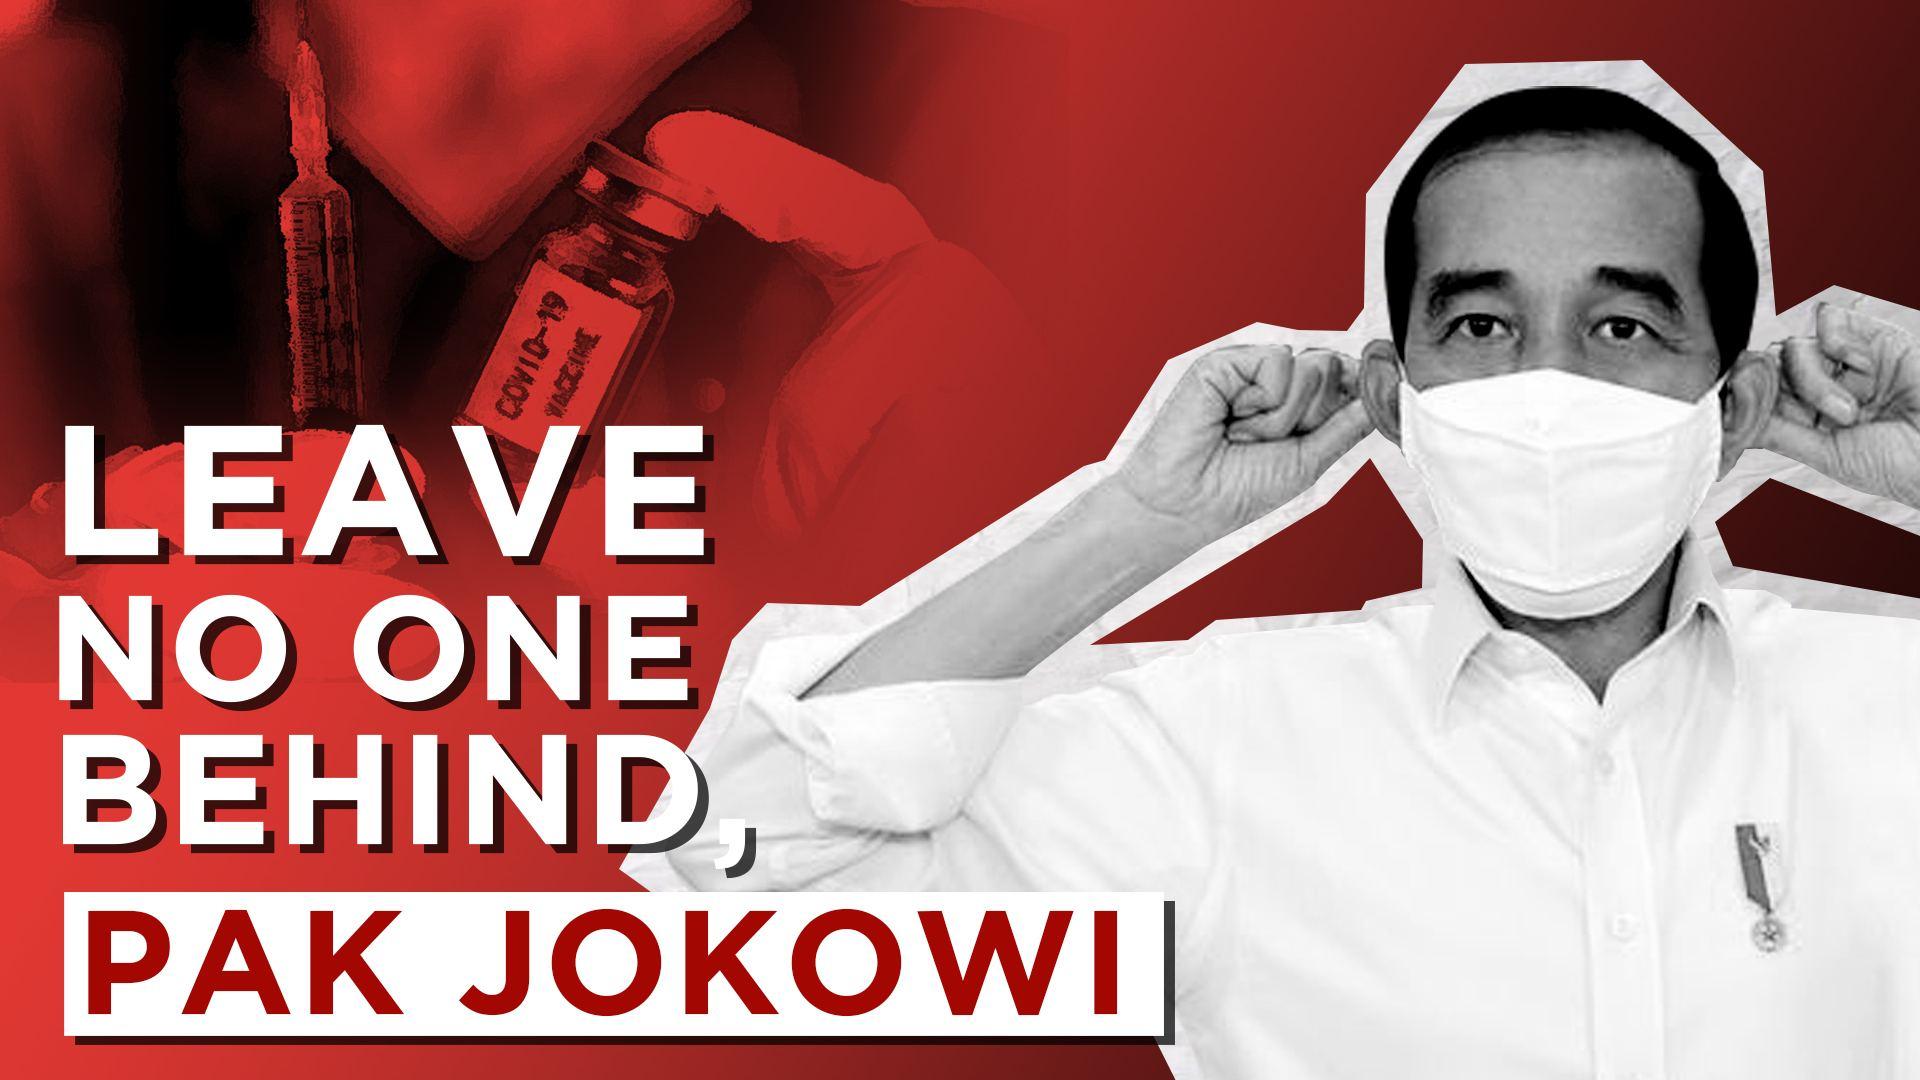 Leave No One Behind, Pak Jokowi